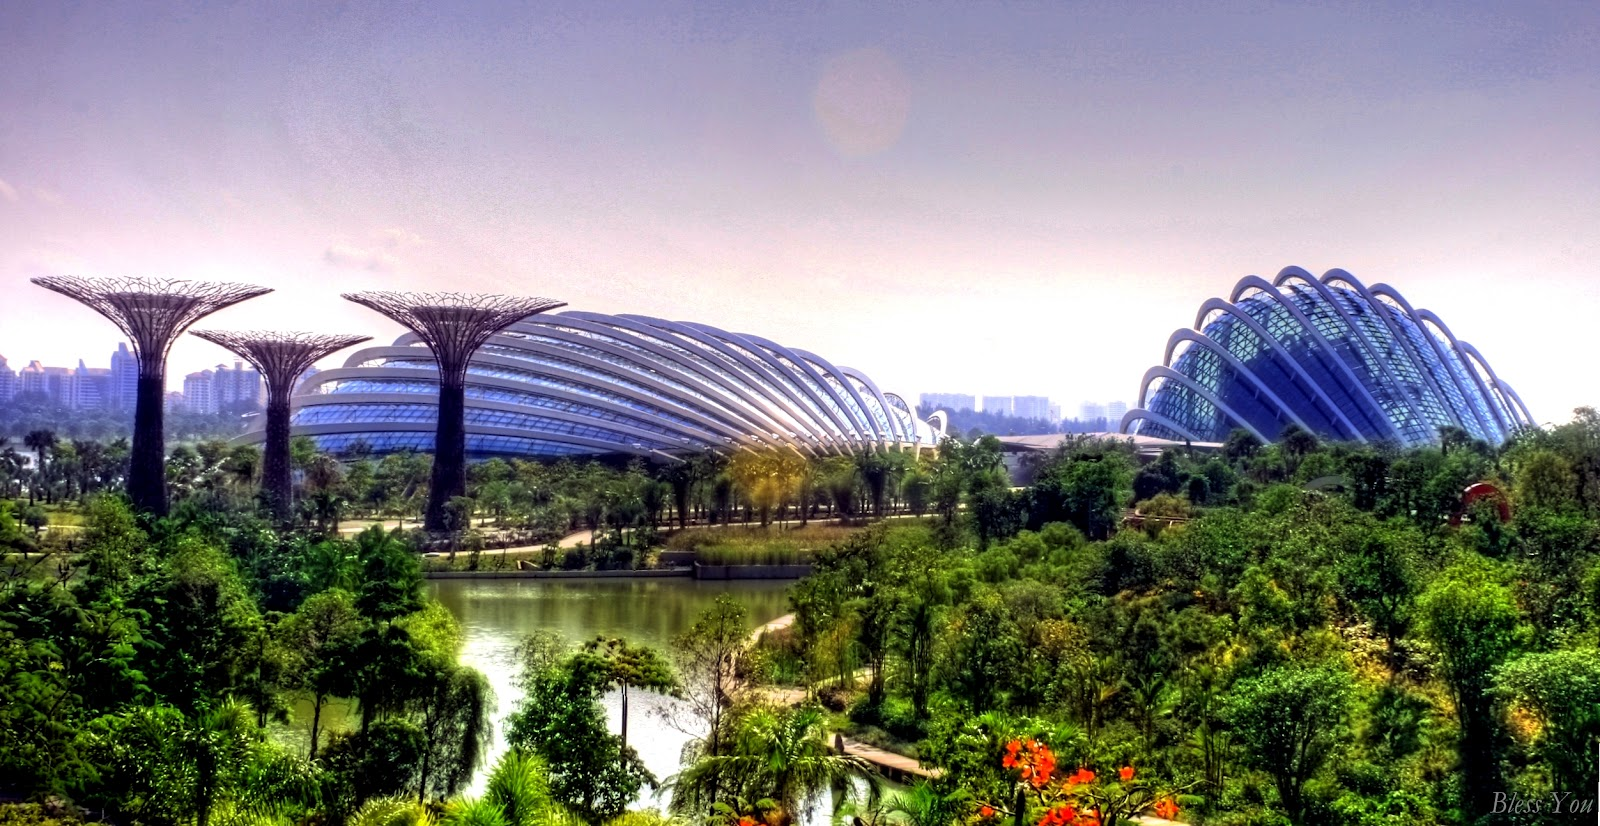 https://hksjsp.files.wordpress.com/2016/02/gardens-by-the-bay-paradise-singapore-1.jpg?w=1600&h=768&crop=1